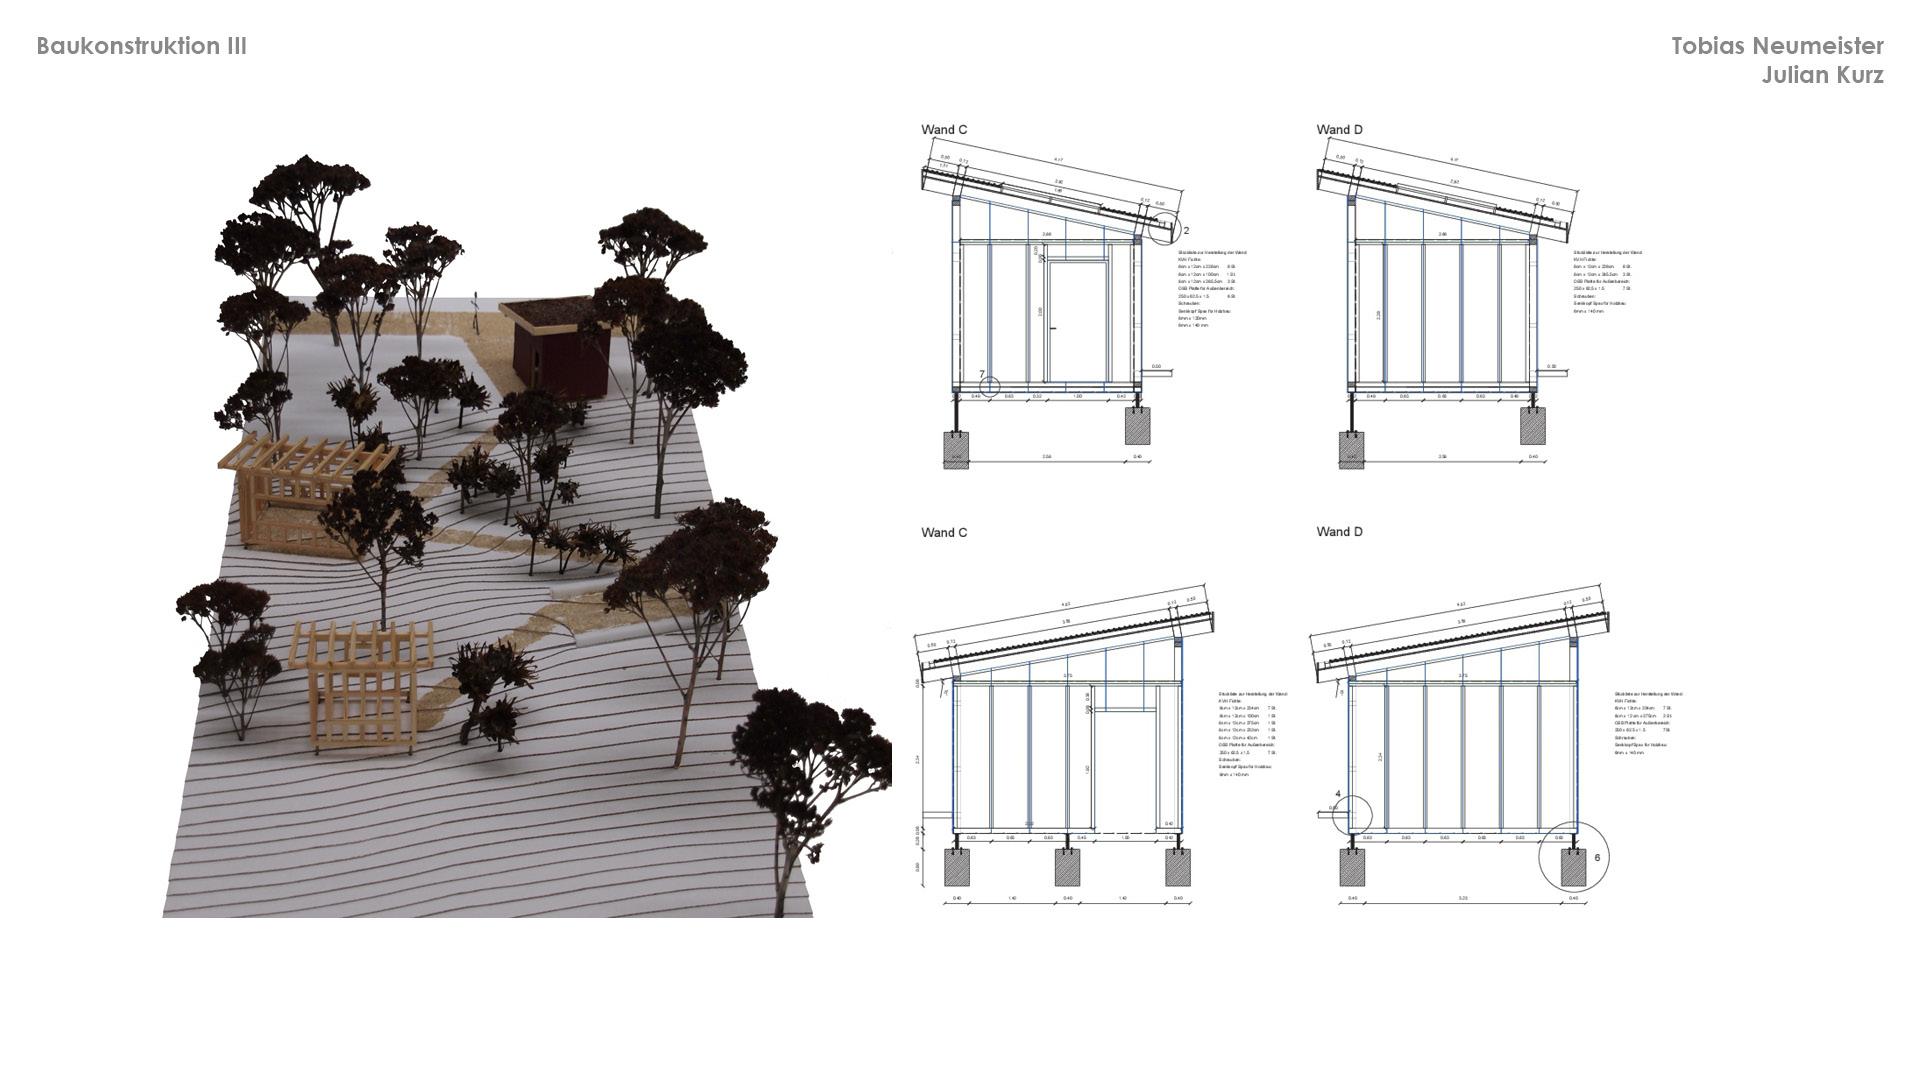 06 2013 3 BaukonstruktionIII